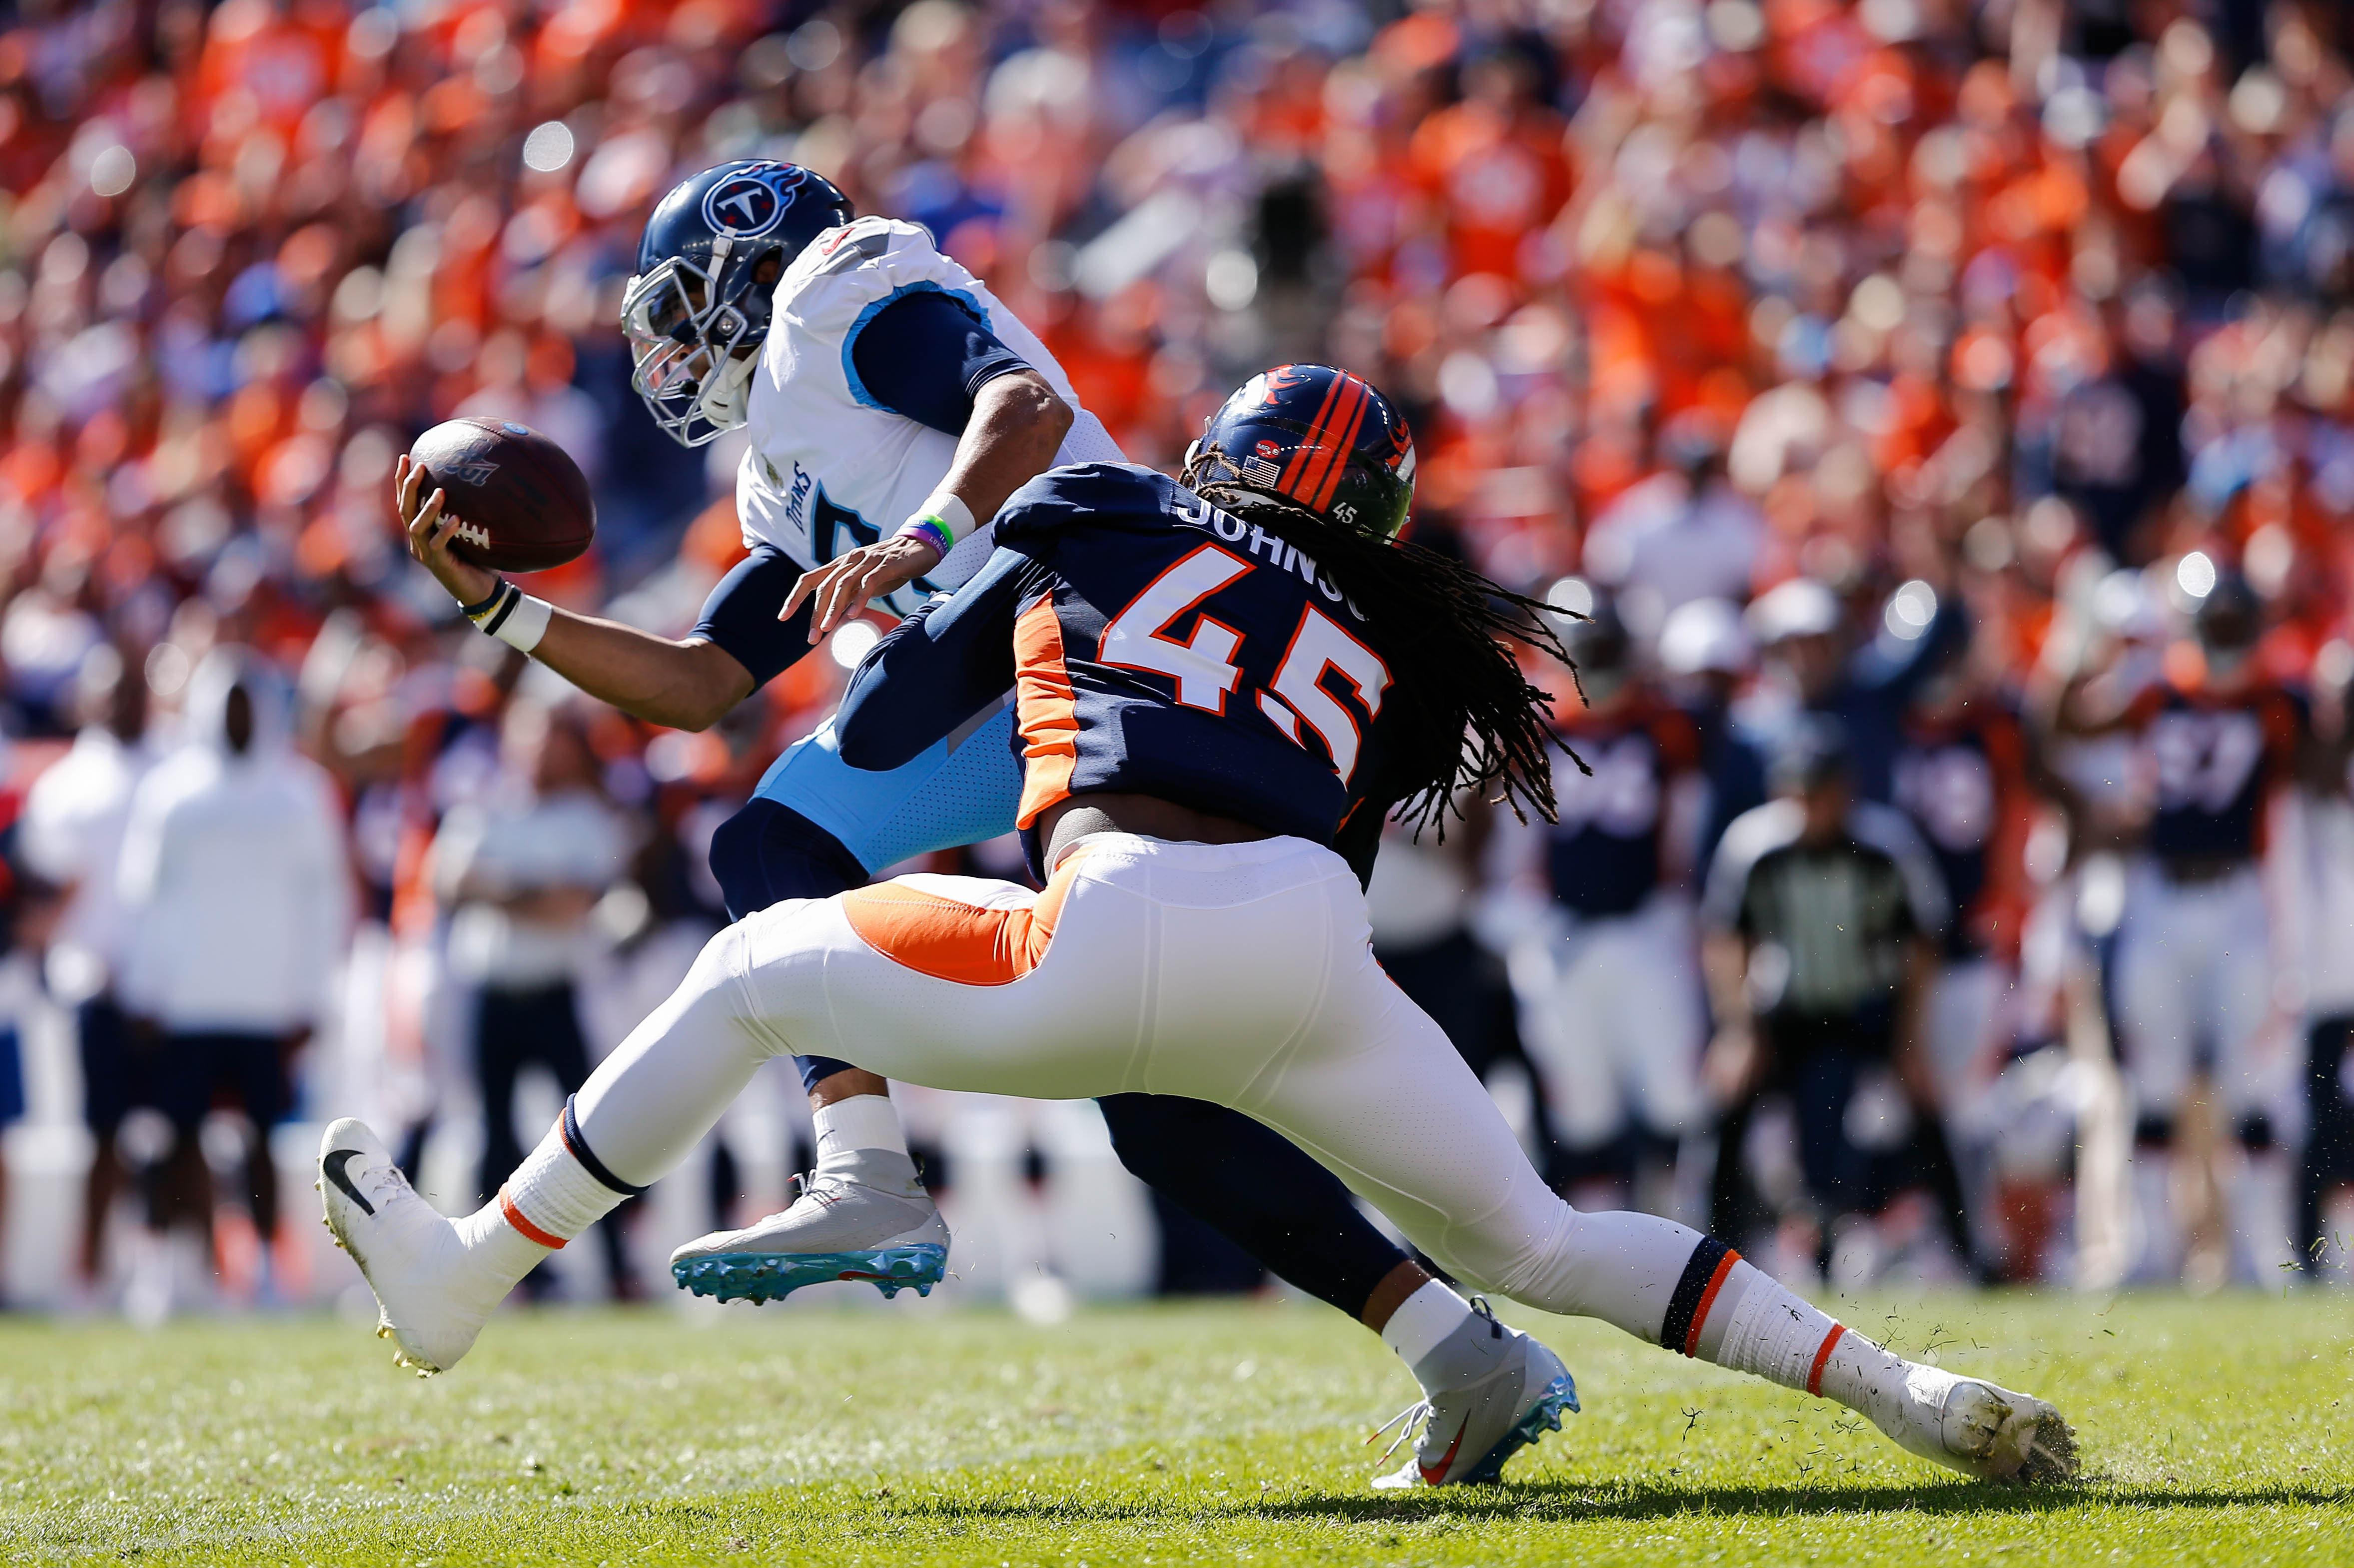 Denver Broncos linebacker Alexander Johnson sacks Tennessee Titans quarterback Marcus Mariota in the first quarter at Empower Field at Mile High.